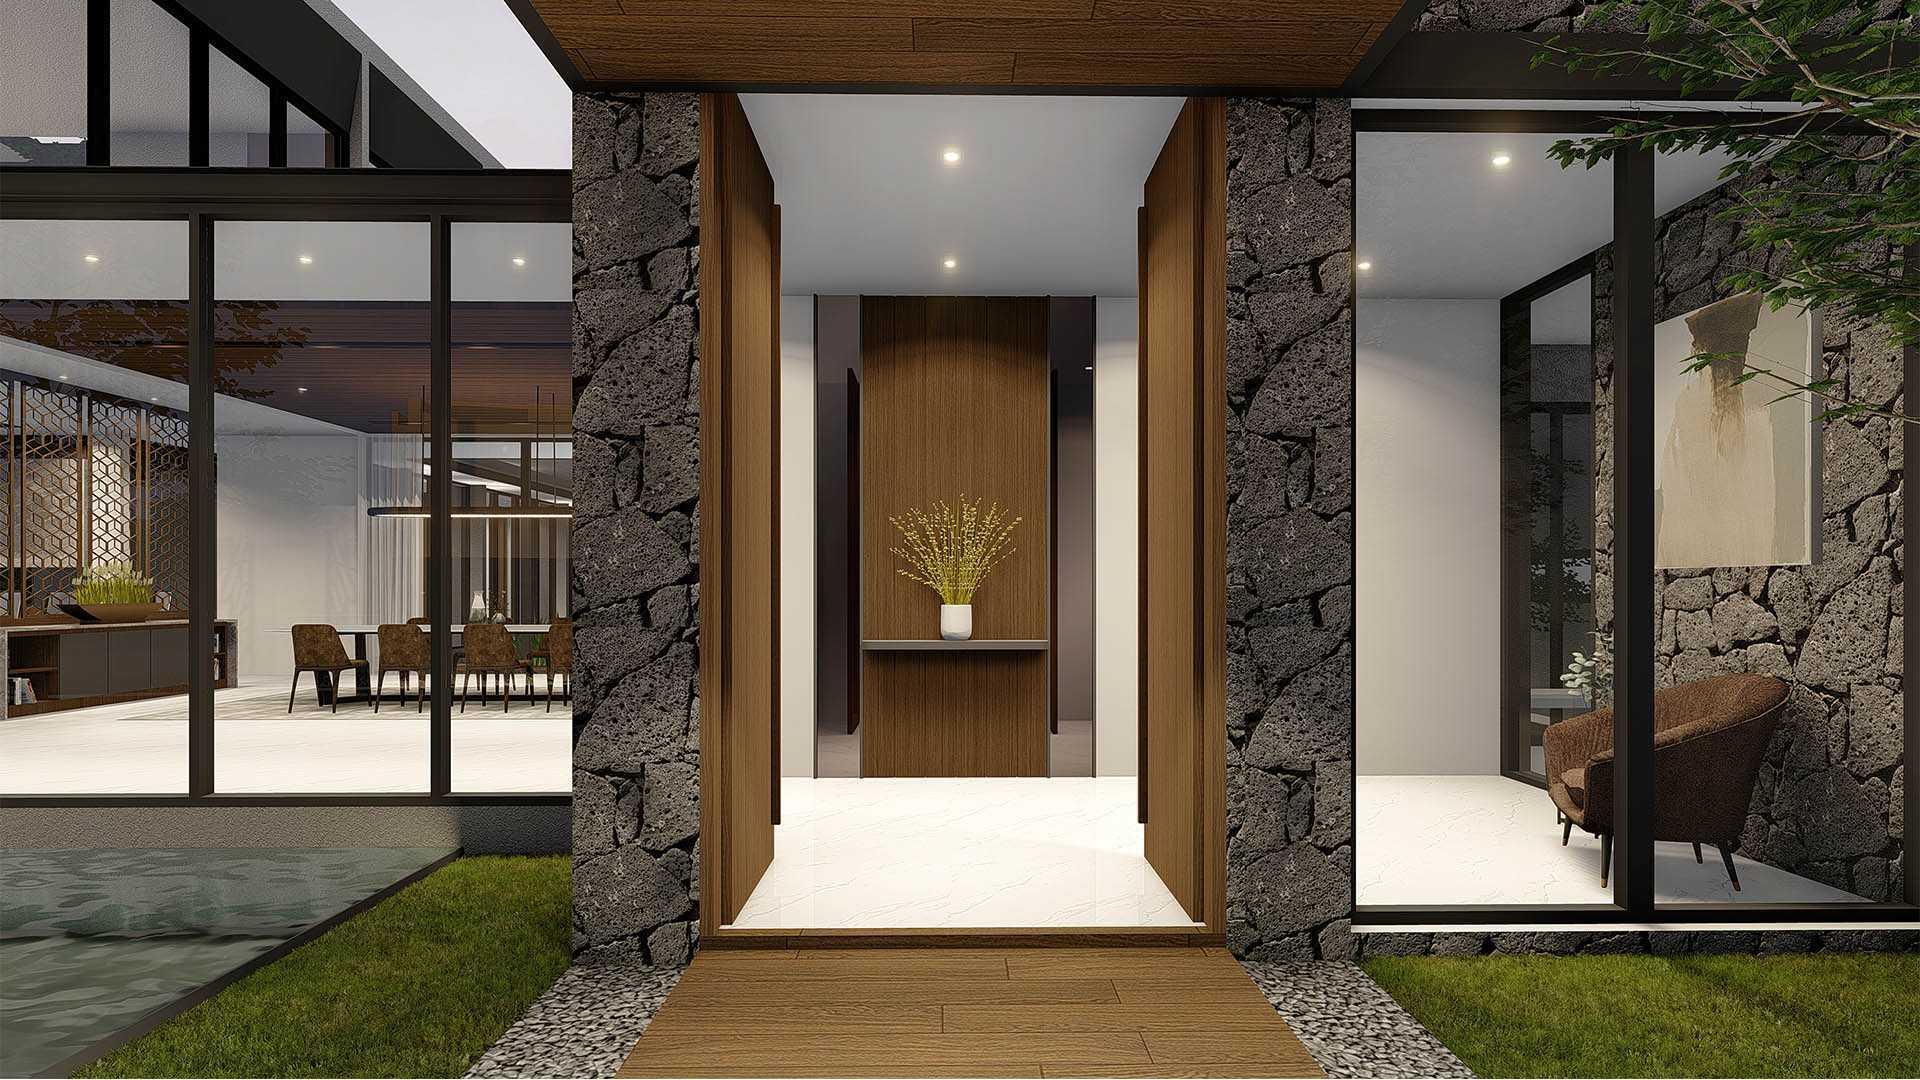 Co Associates J House Lampung, Indonesia Lampung, Indonesia Co-Associates-J-House   97022